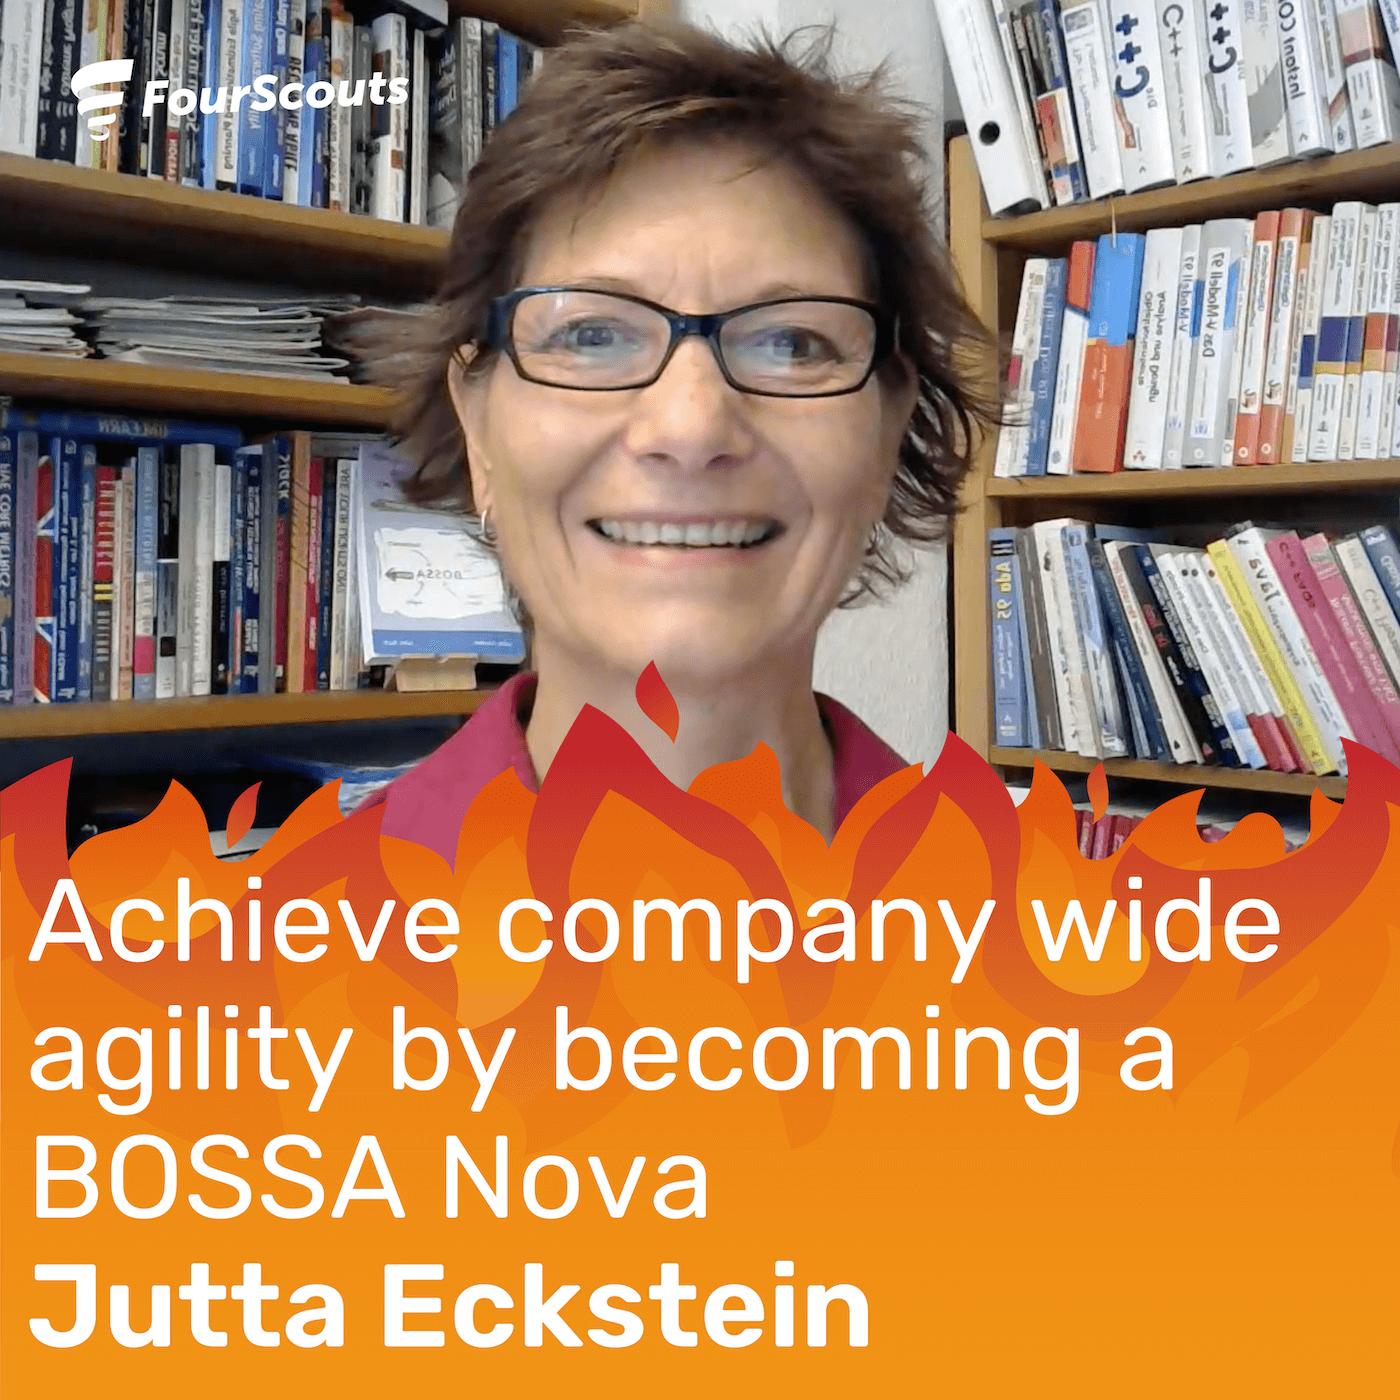 Achieve company wide agility by becoming a BOSSA Nova, with Jutta Eckstein